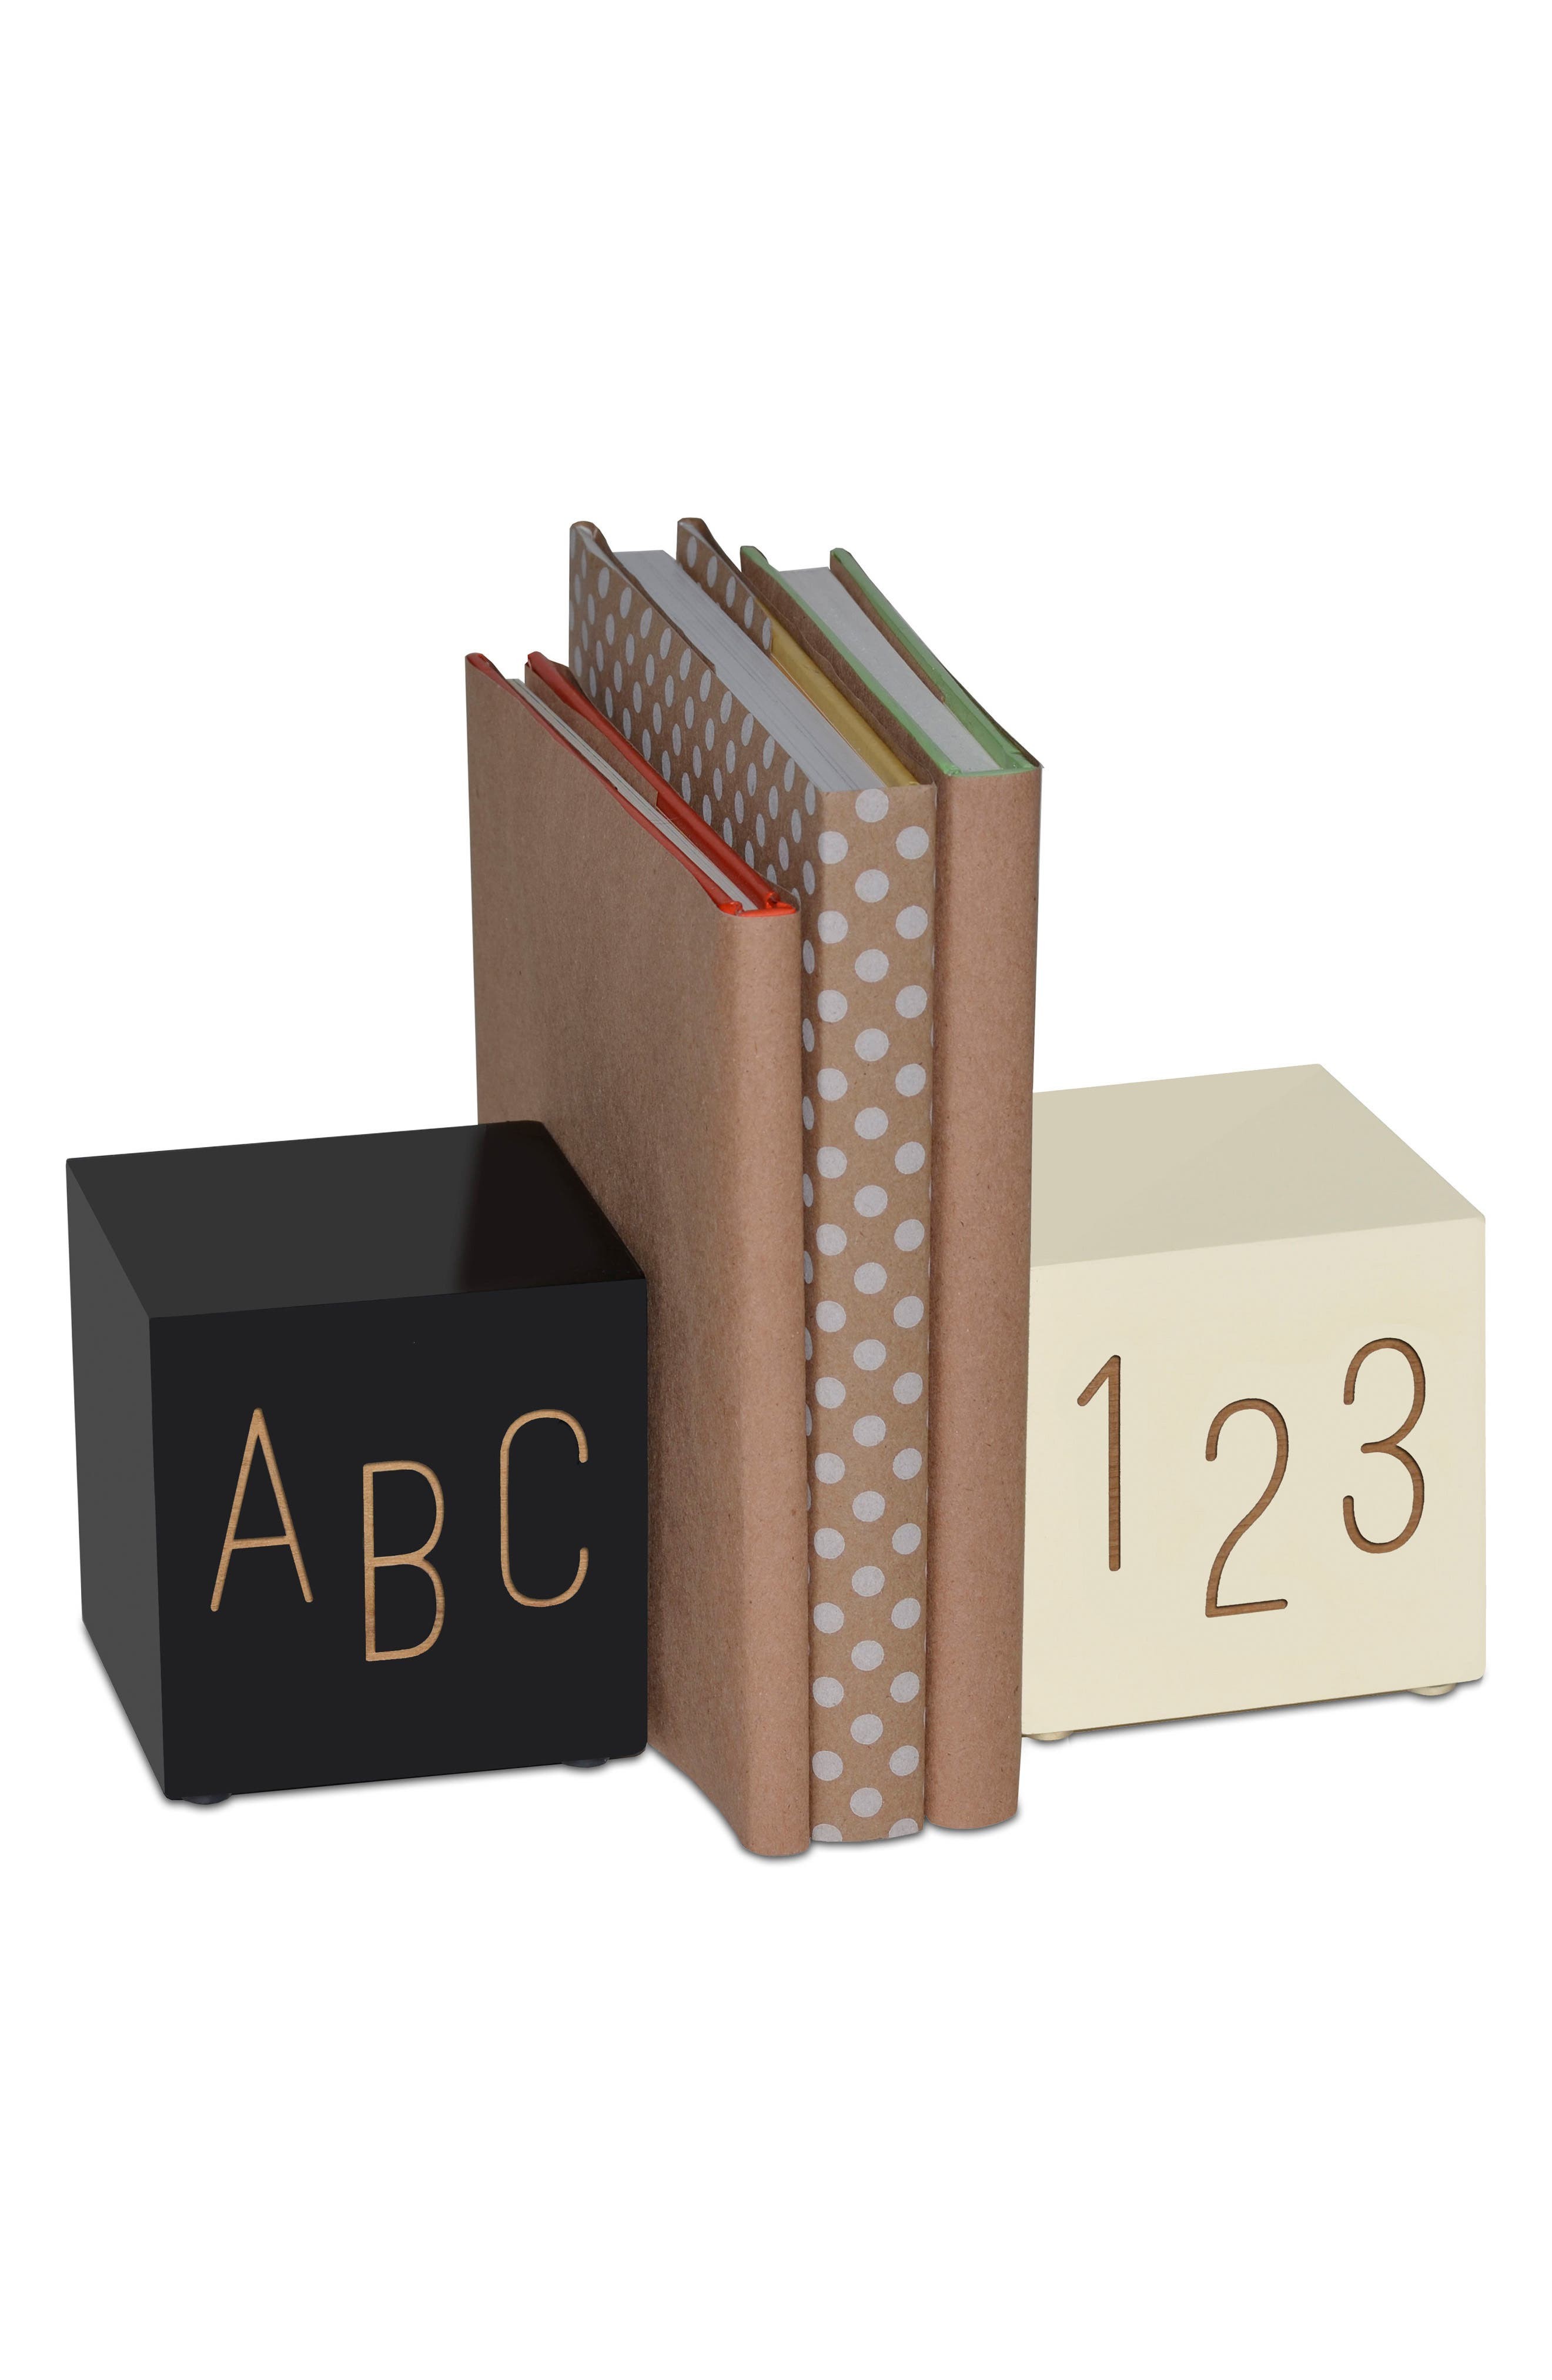 ABC123 Book Ends,                             Main thumbnail 1, color,                             001